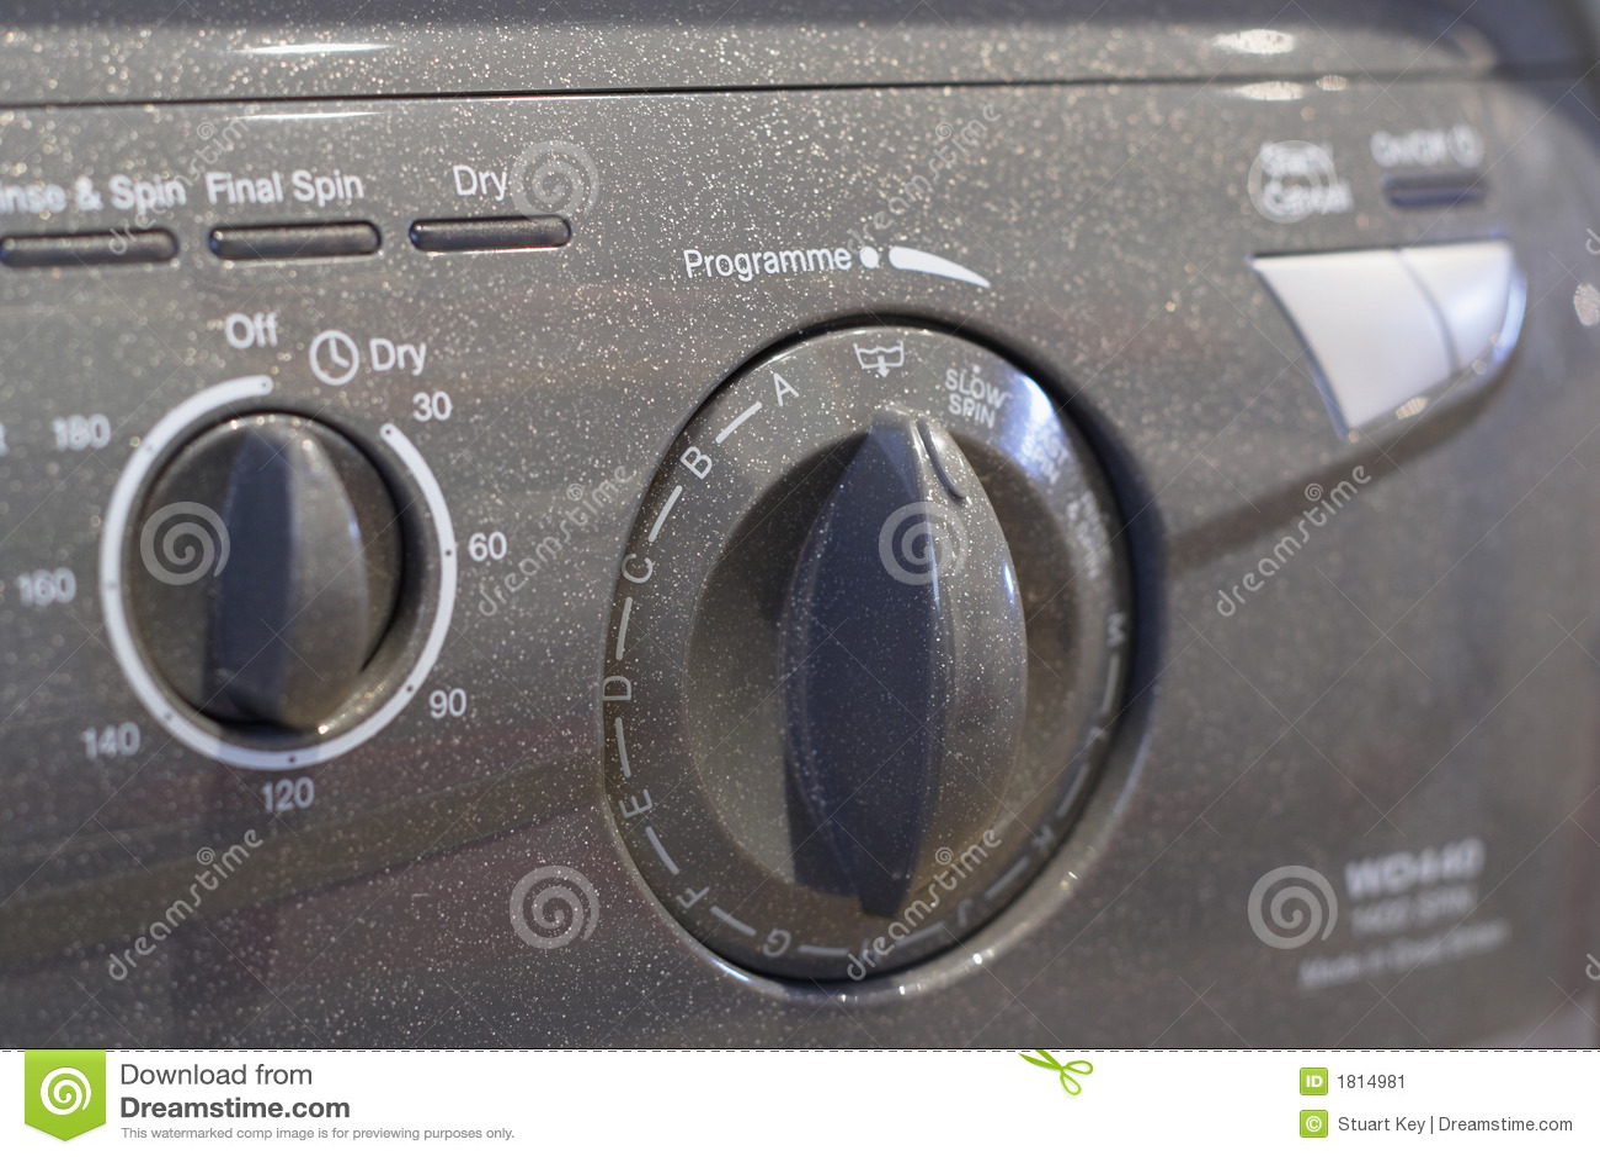 Washer Dryer panel